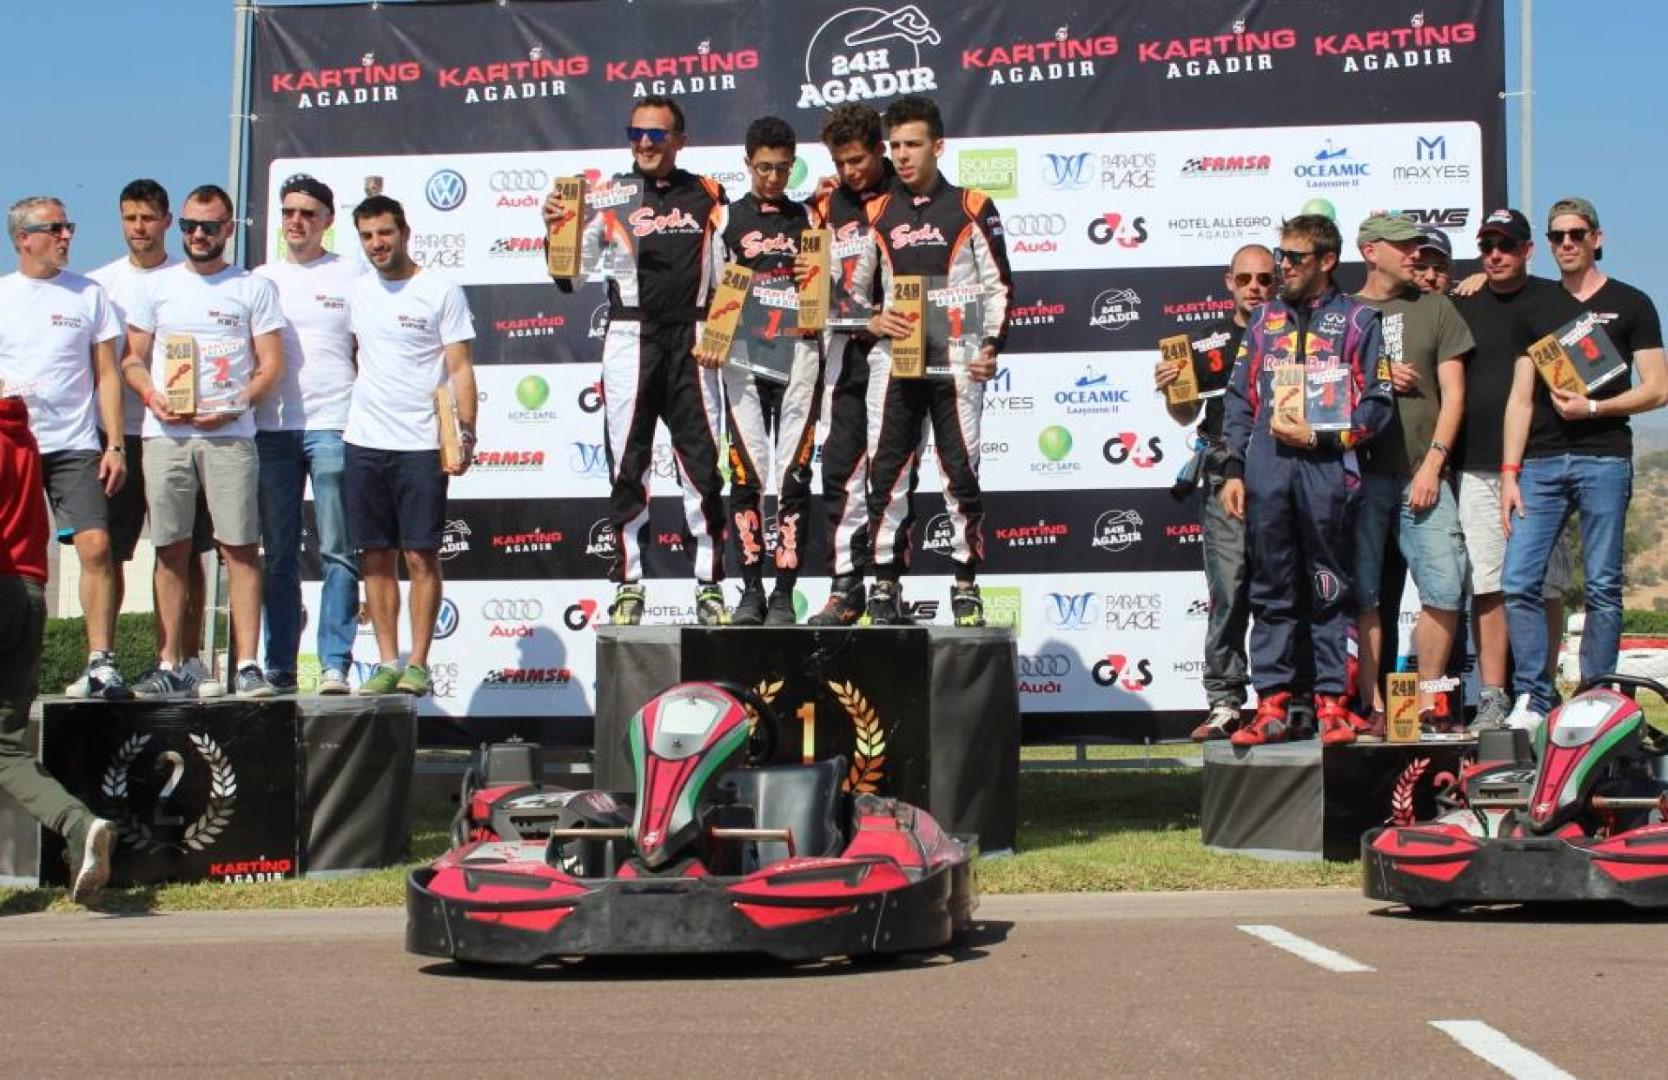 24H Karting d'Agadir : Manche 1